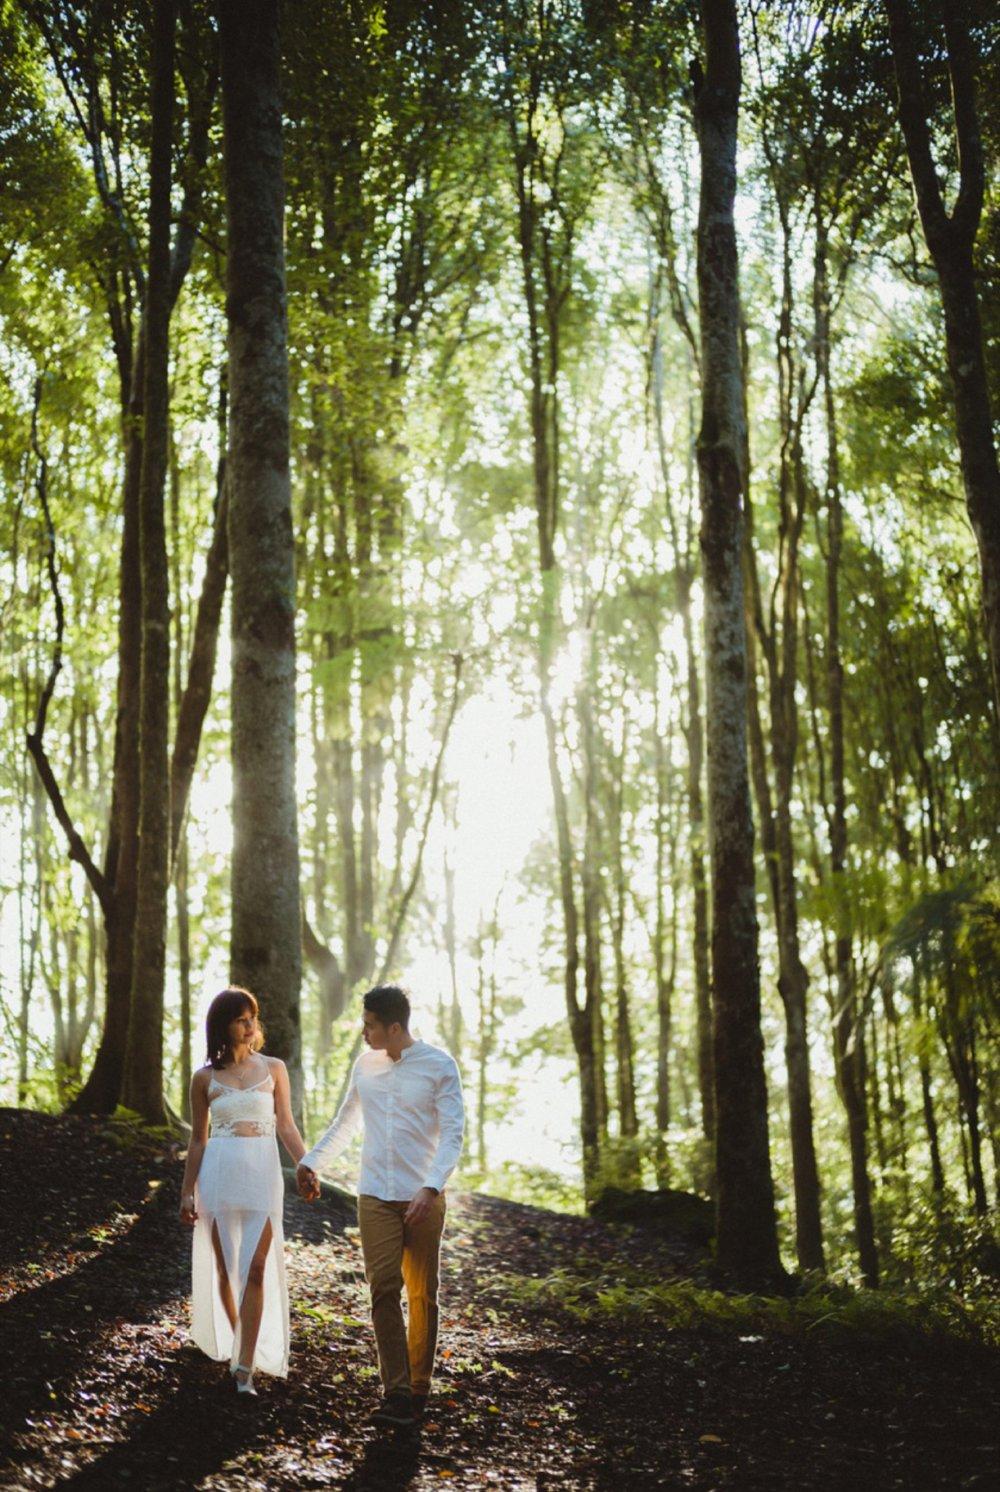 Surya-Chossy-Bali-Prewedding-Pyara-Photo-Evans 38.jpg